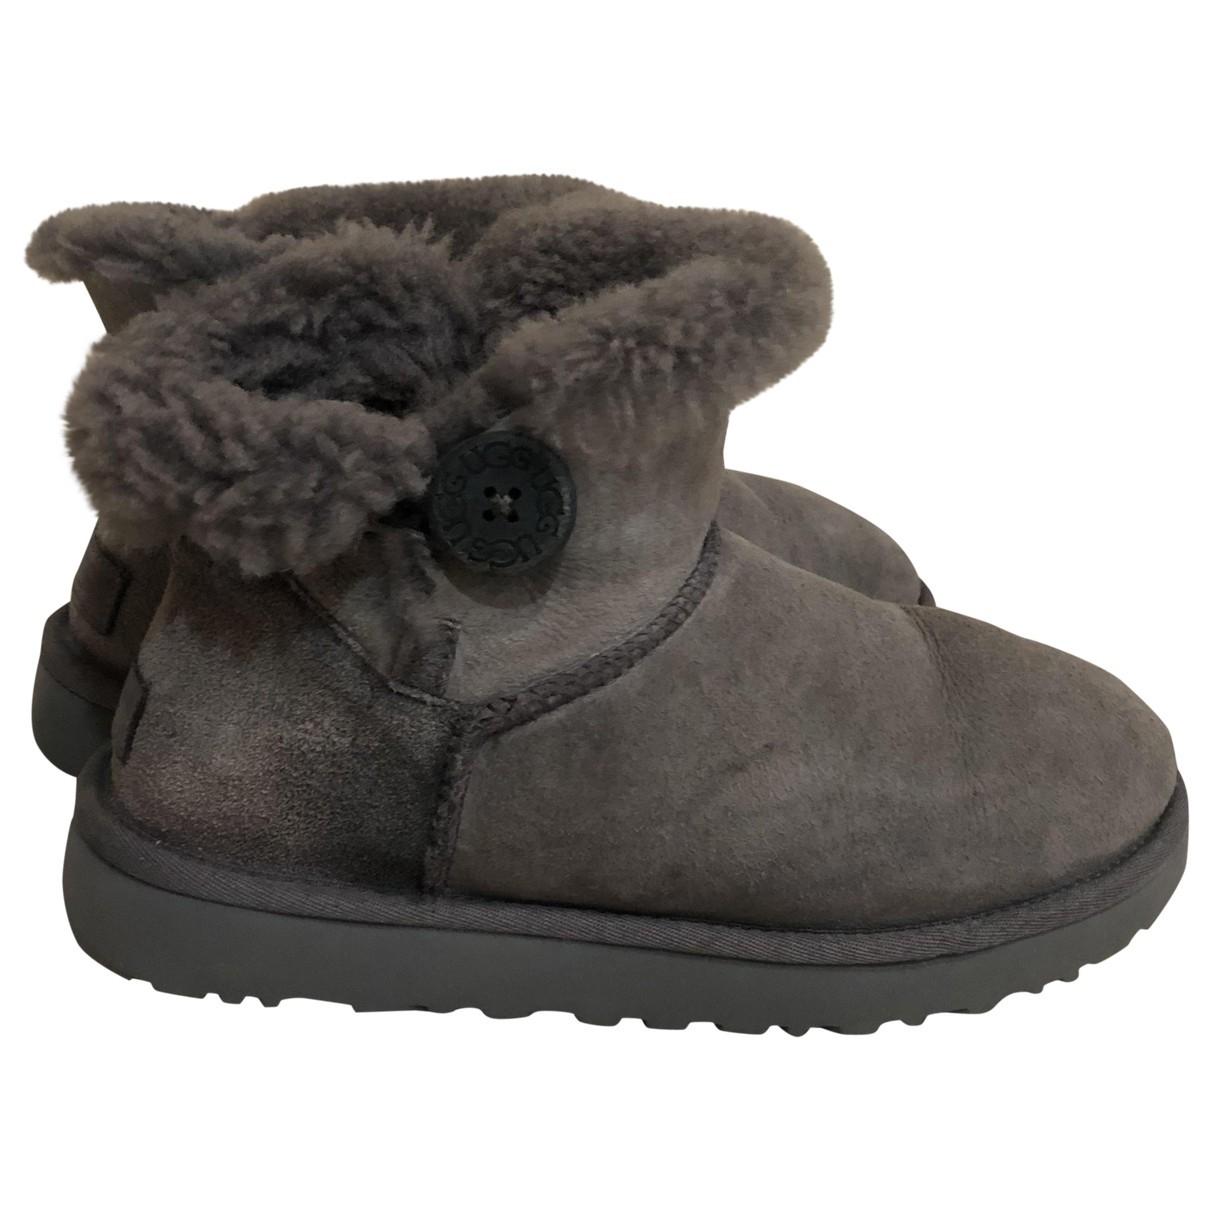 Ugg \N Grey Suede Boots for Women 39 EU